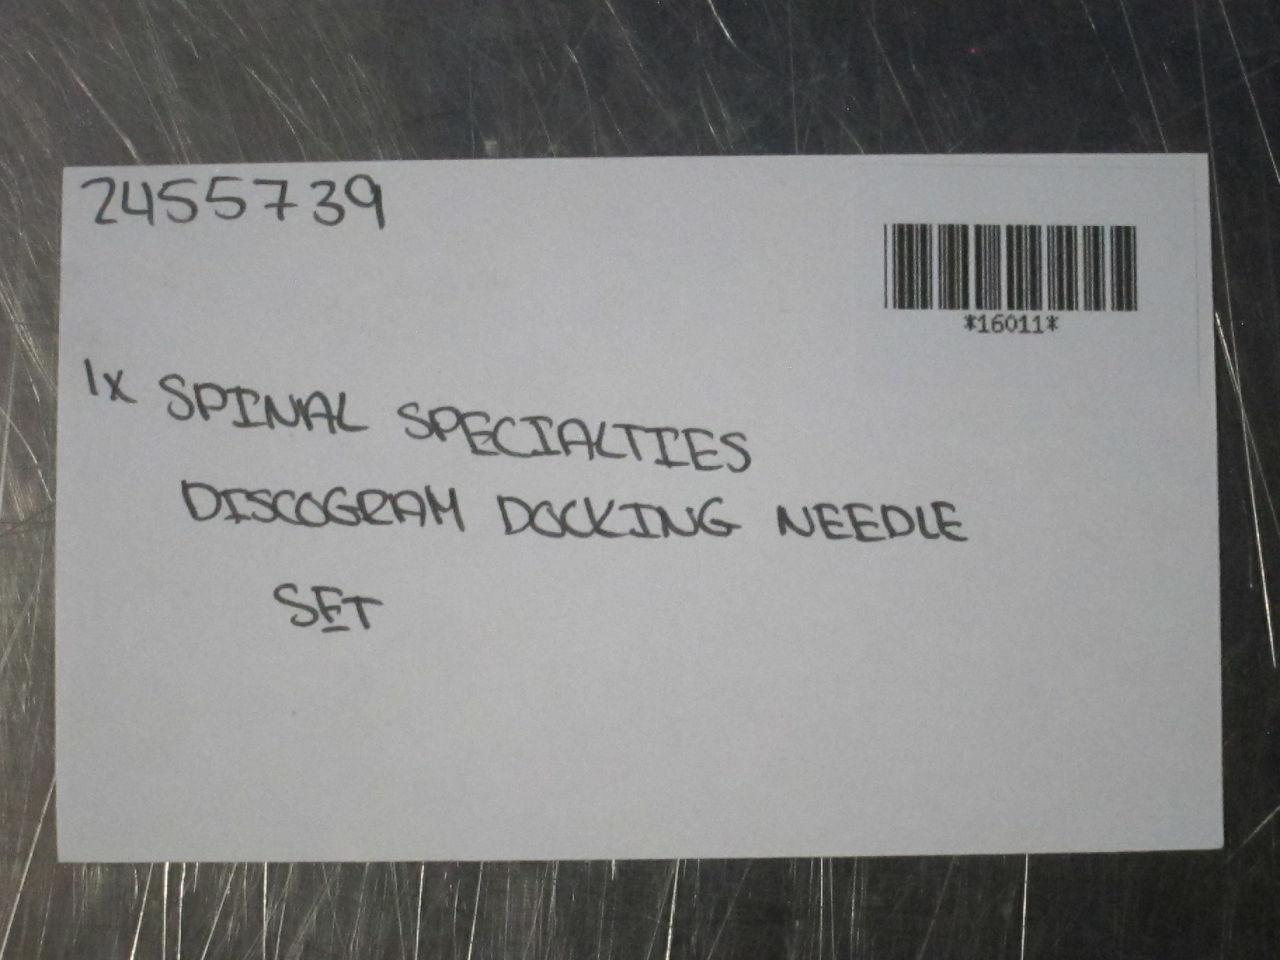 SPINAL SPECIALTIES Discogram Needle Set